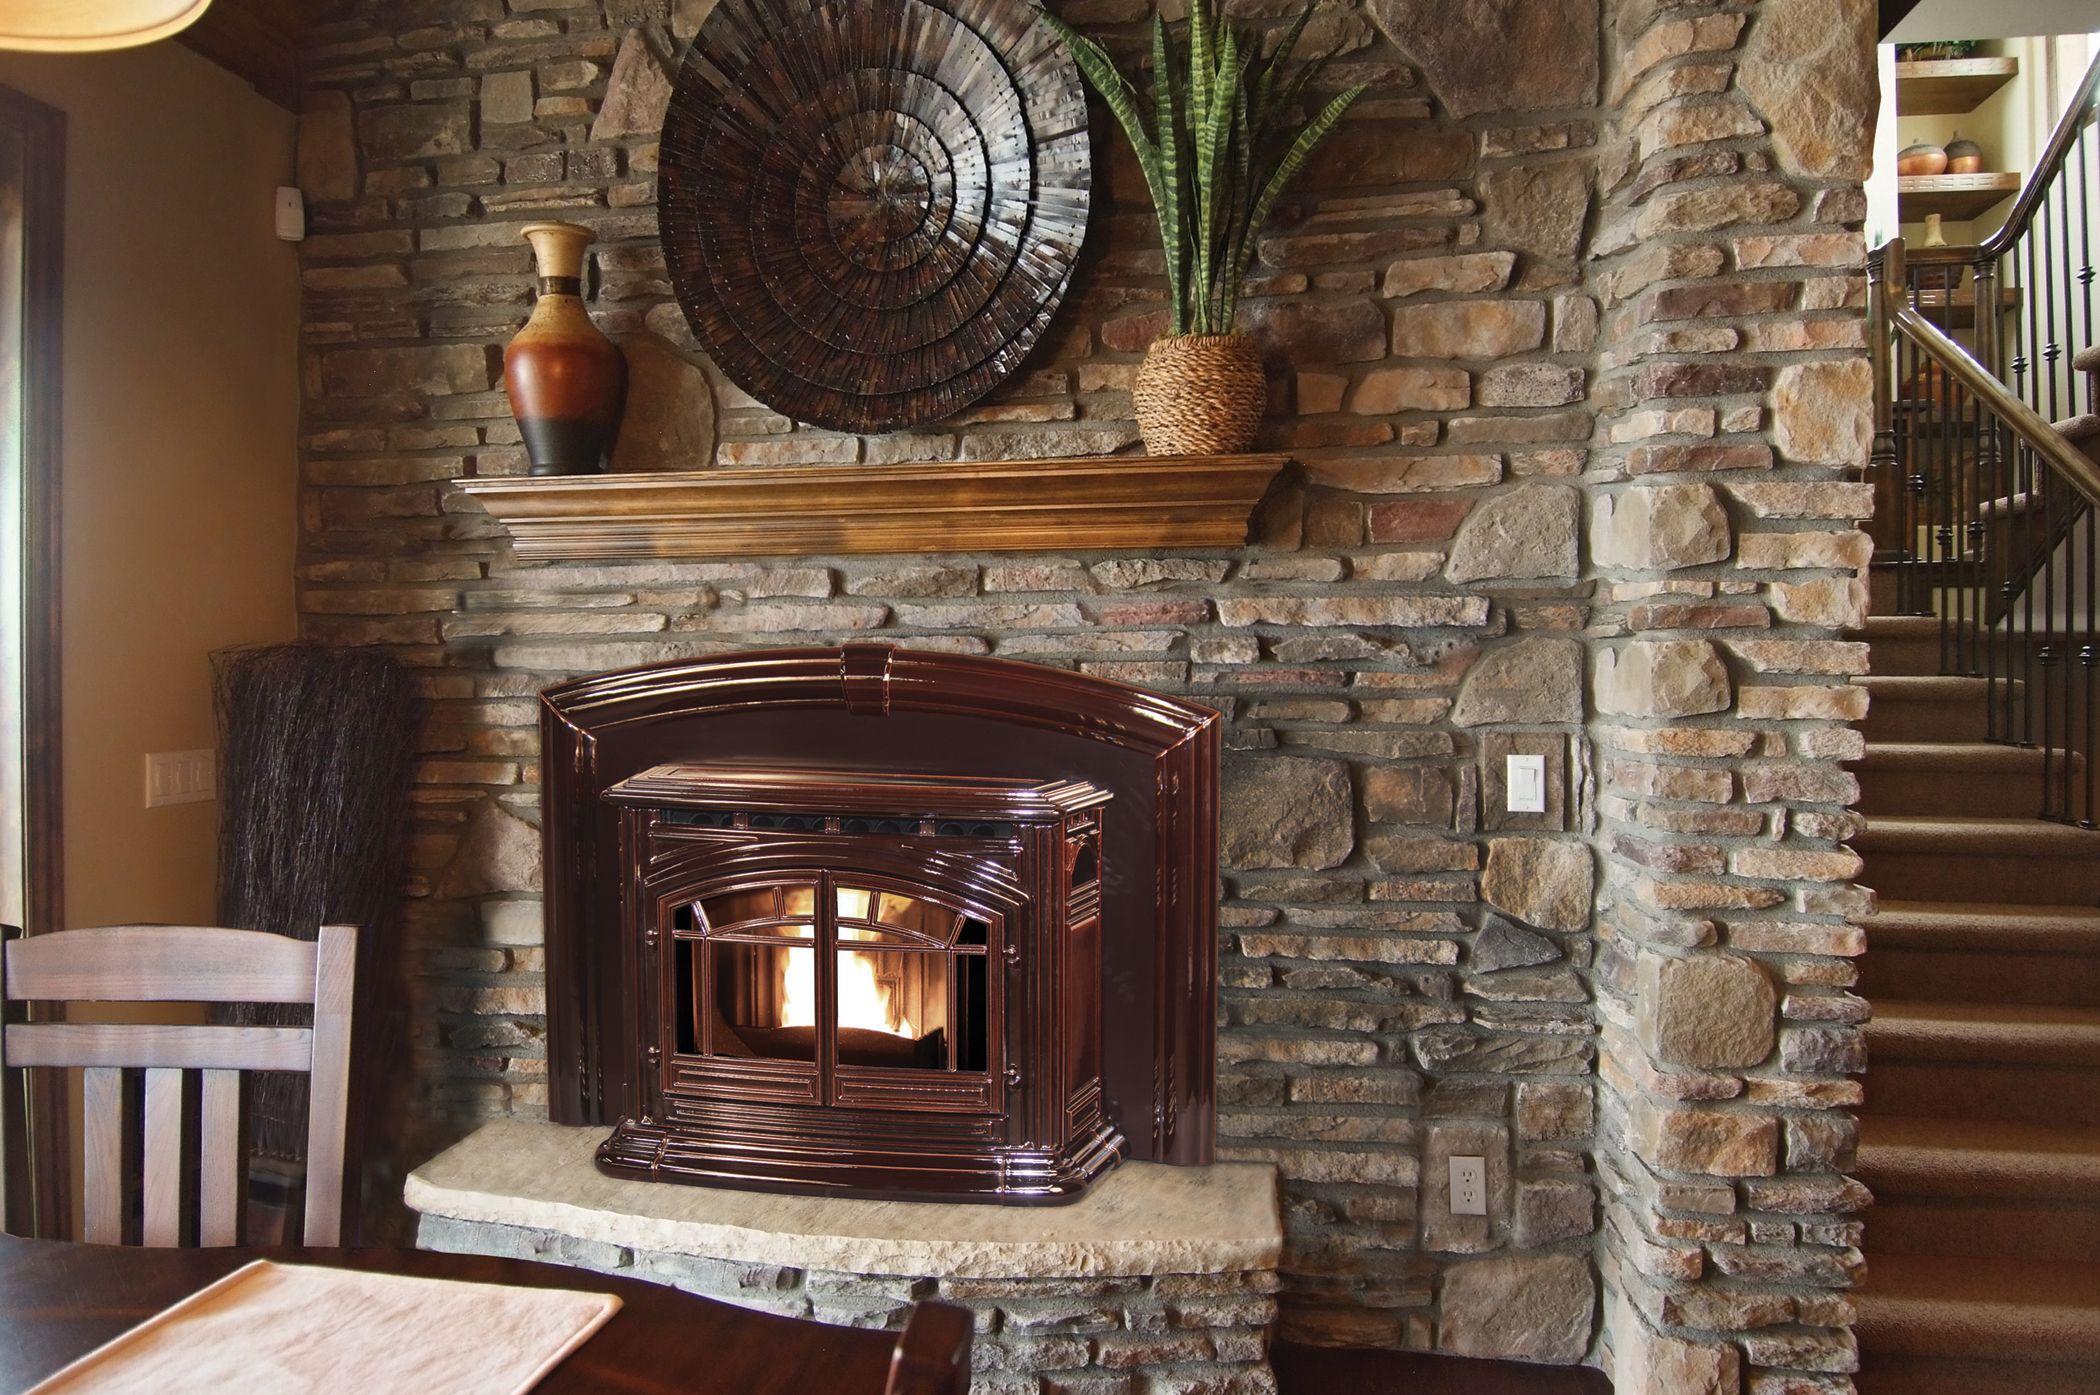 The Enviro M55 Cast Iron Pellet Fireplace Insert